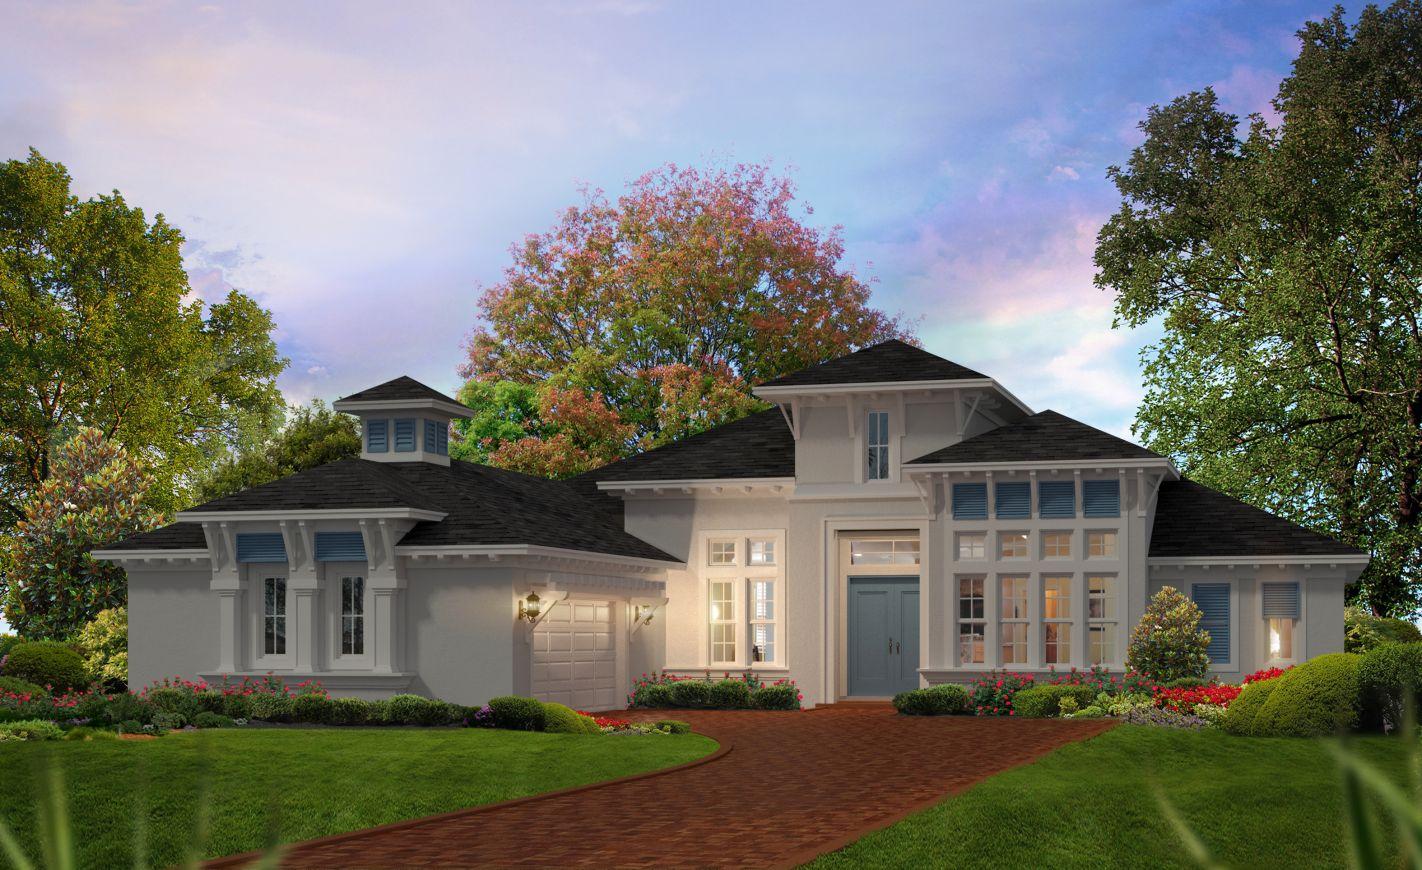 Homes for Sale in Plantation Bay | Plantation Bay Golf